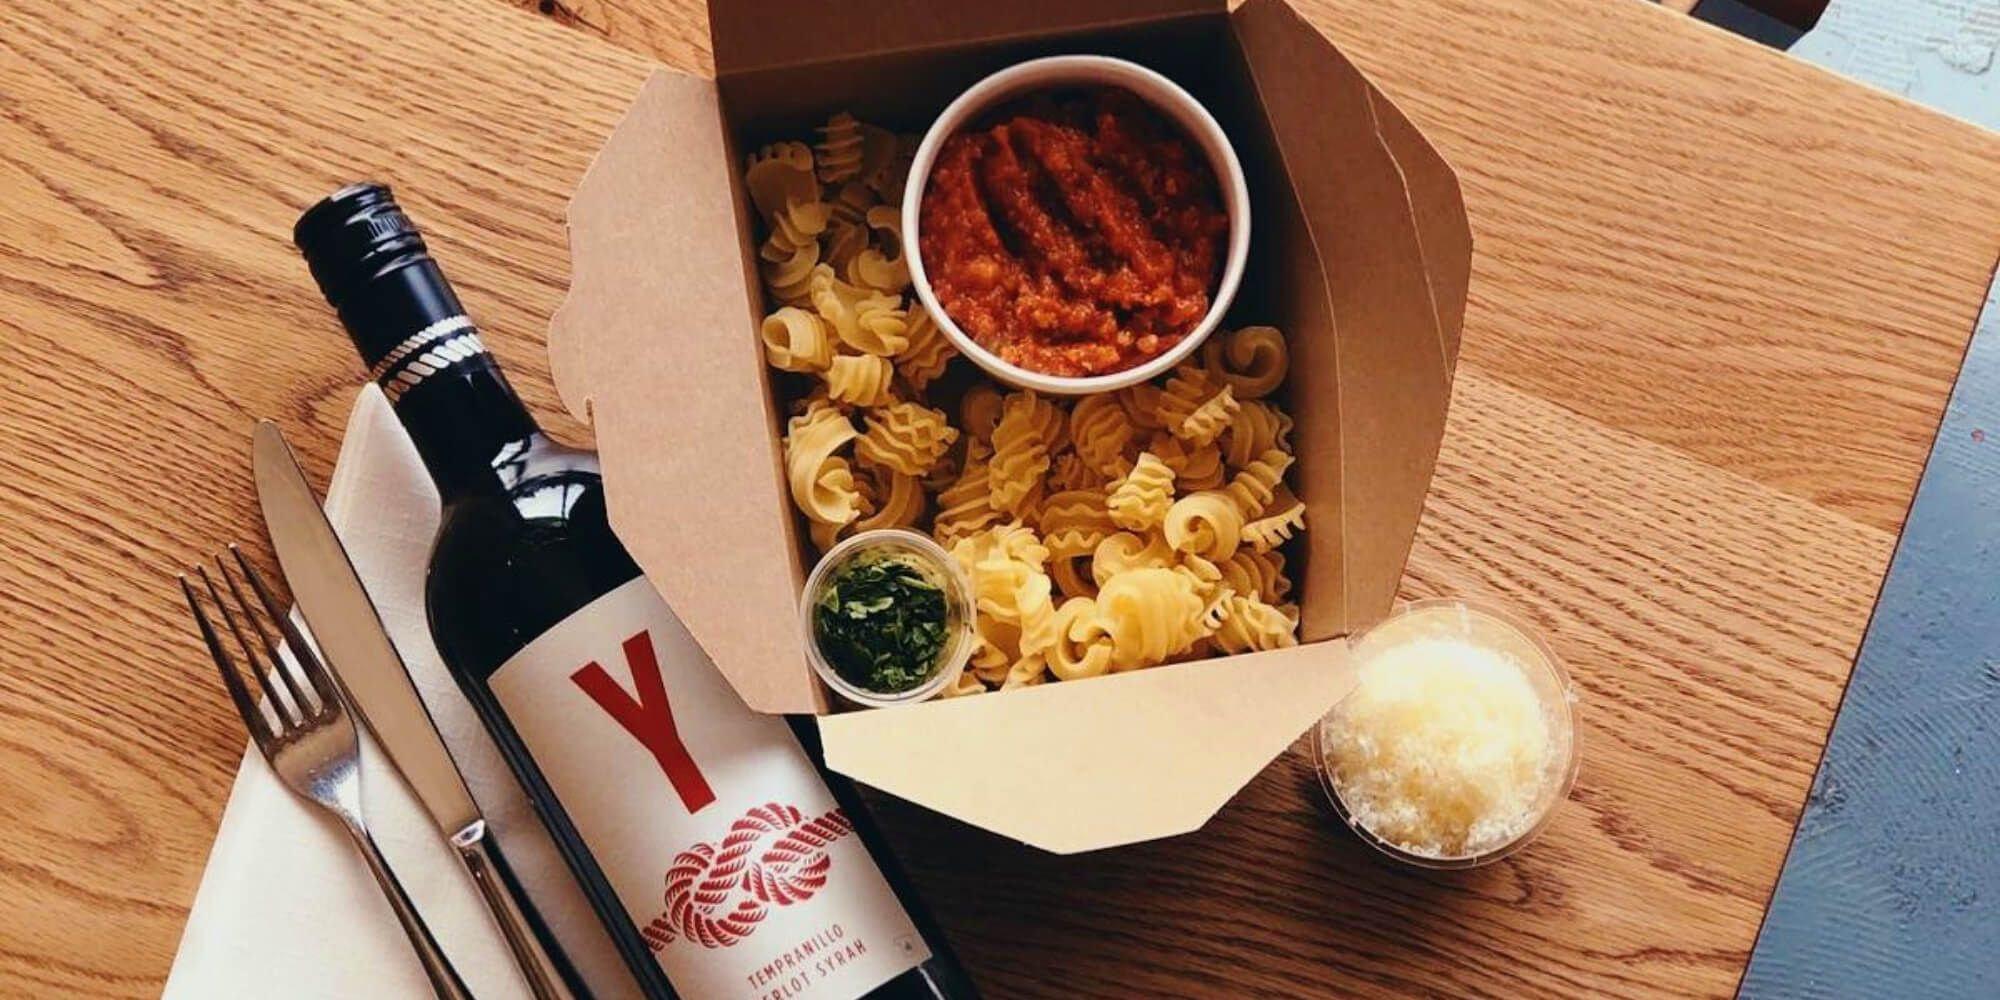 Sarto pasta and wine